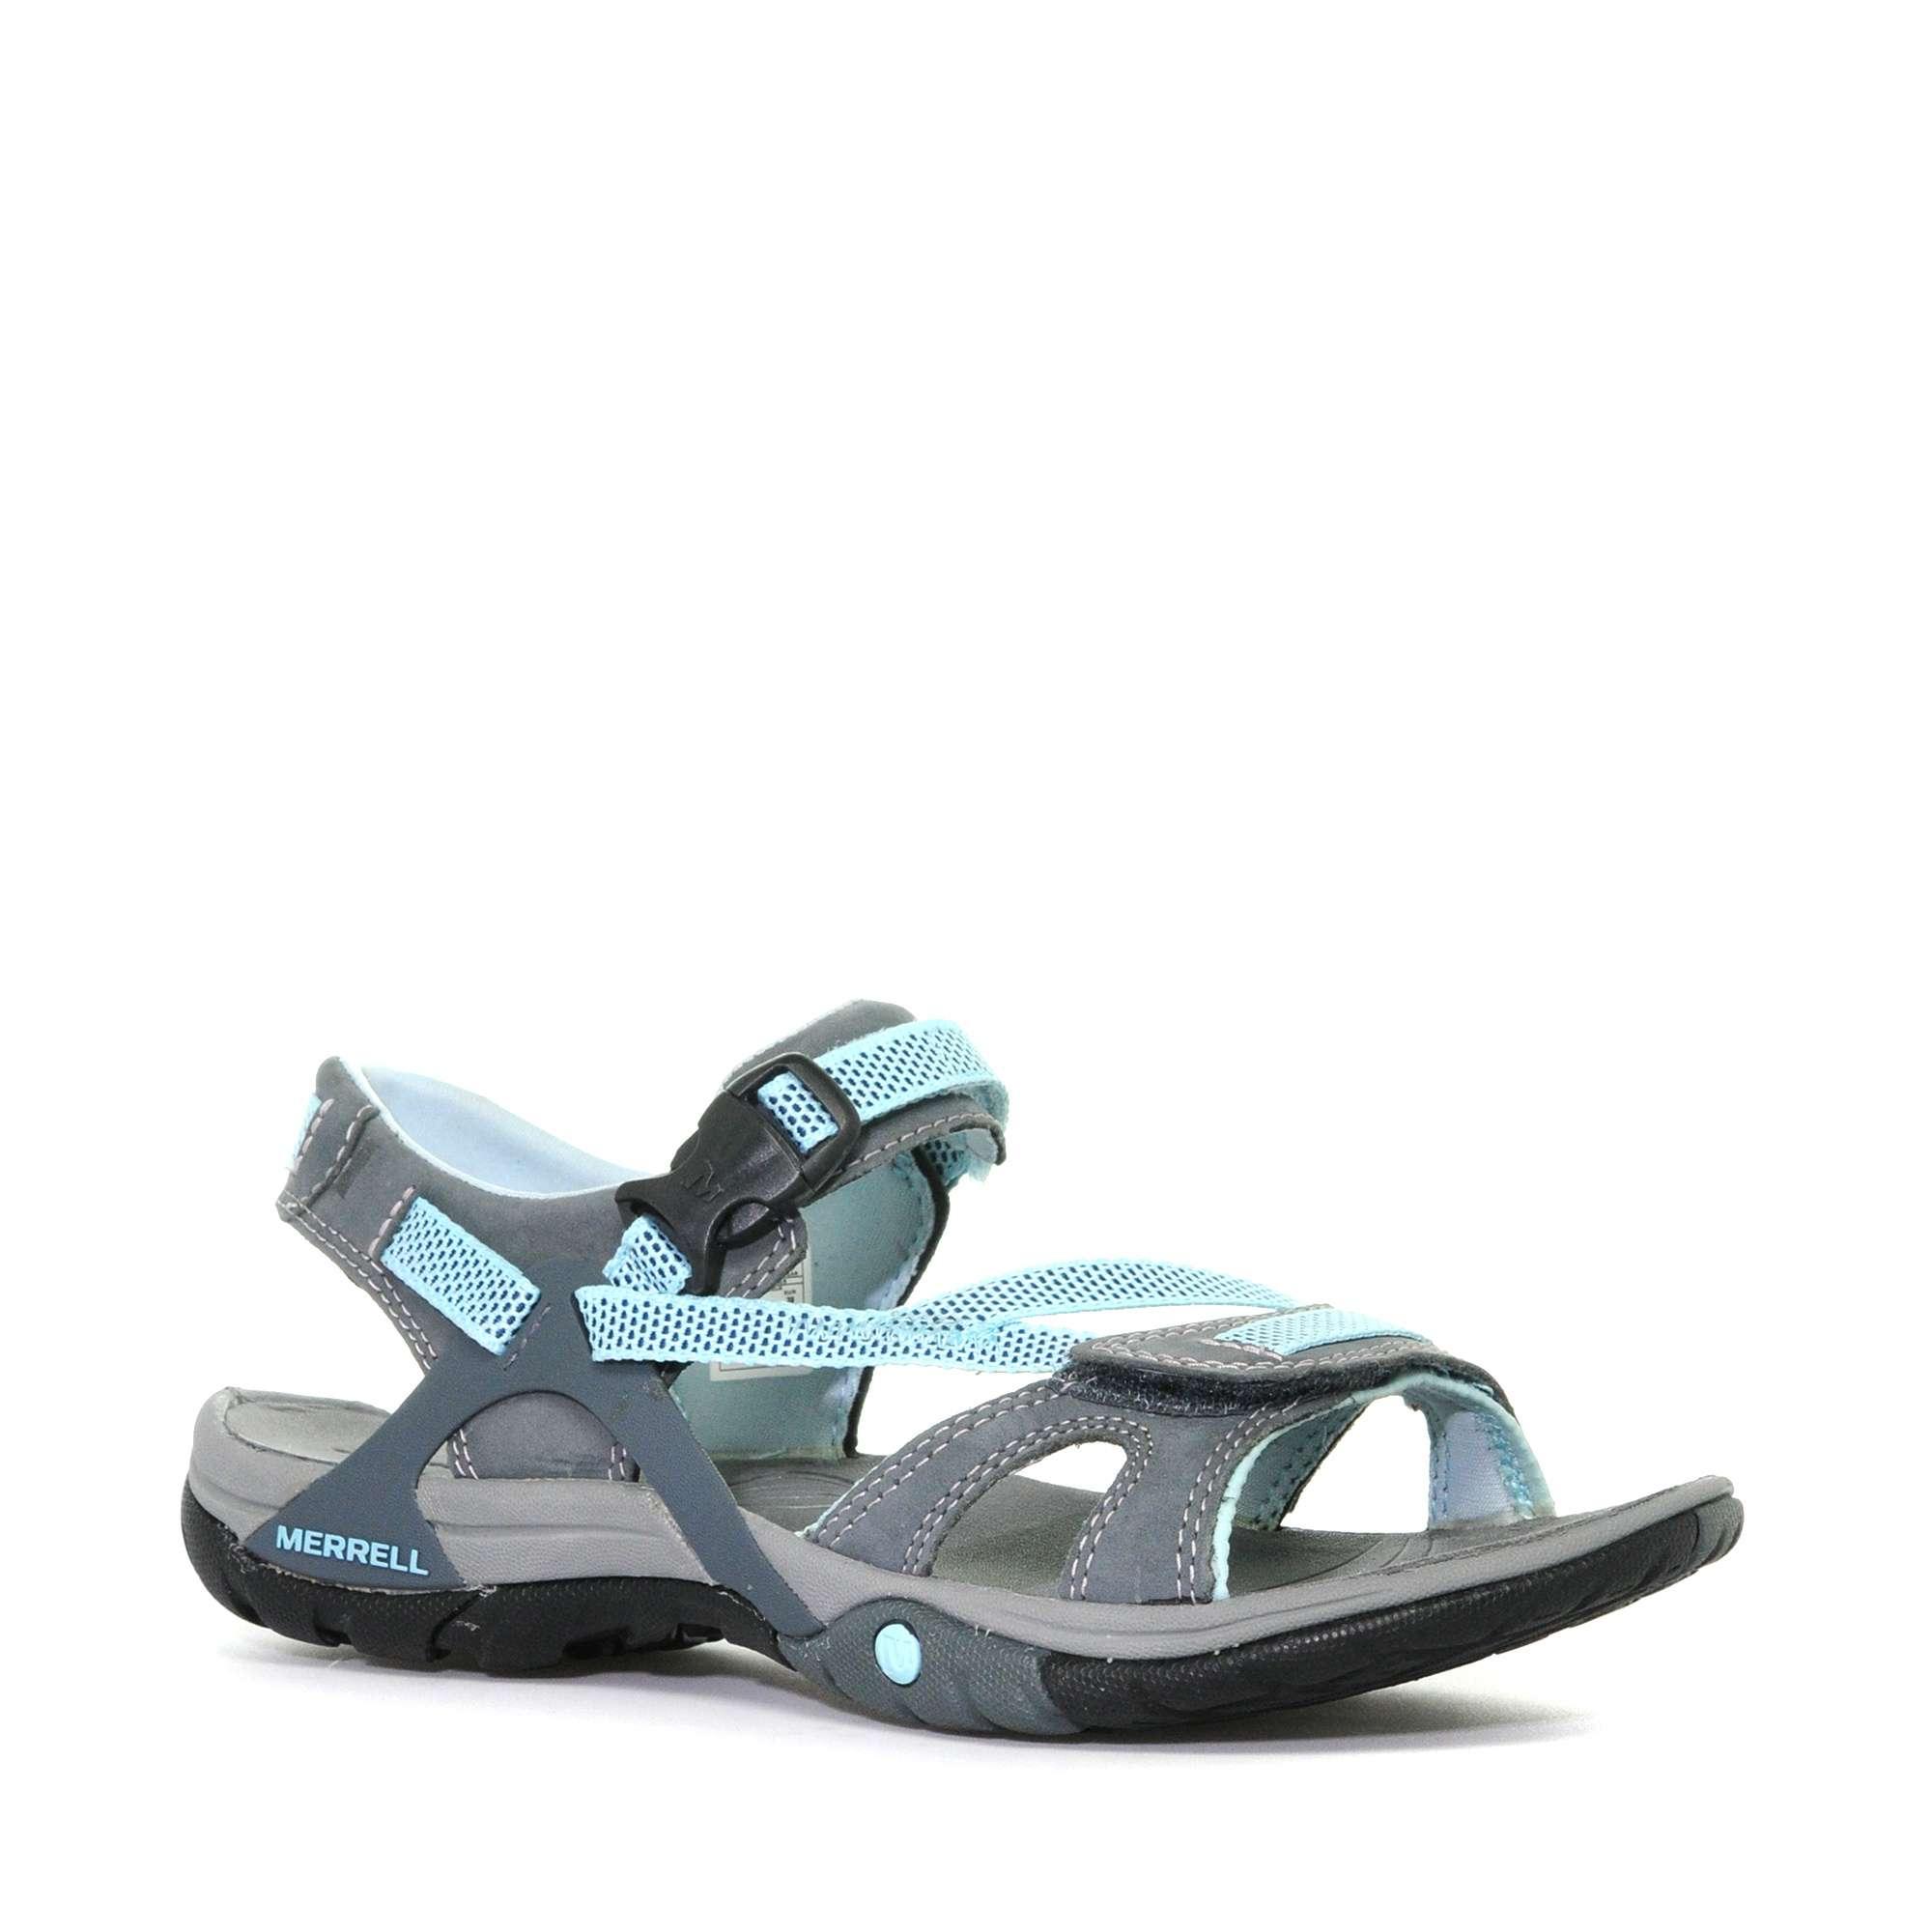 Merrell Azura Light Trail Shoes Women